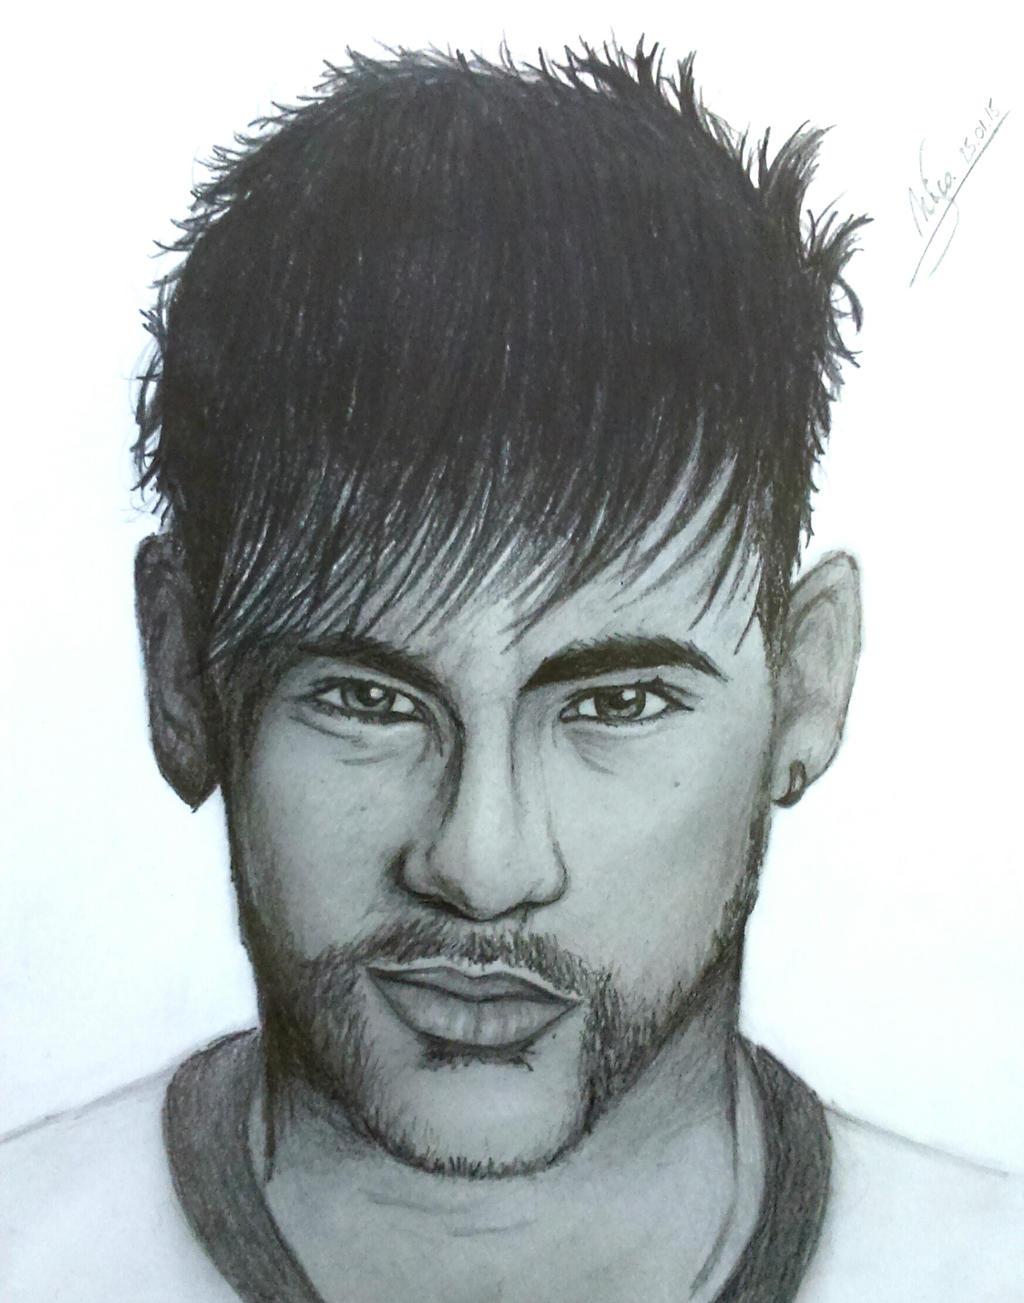 Neymar JR By Nicoo1995 On DeviantArt